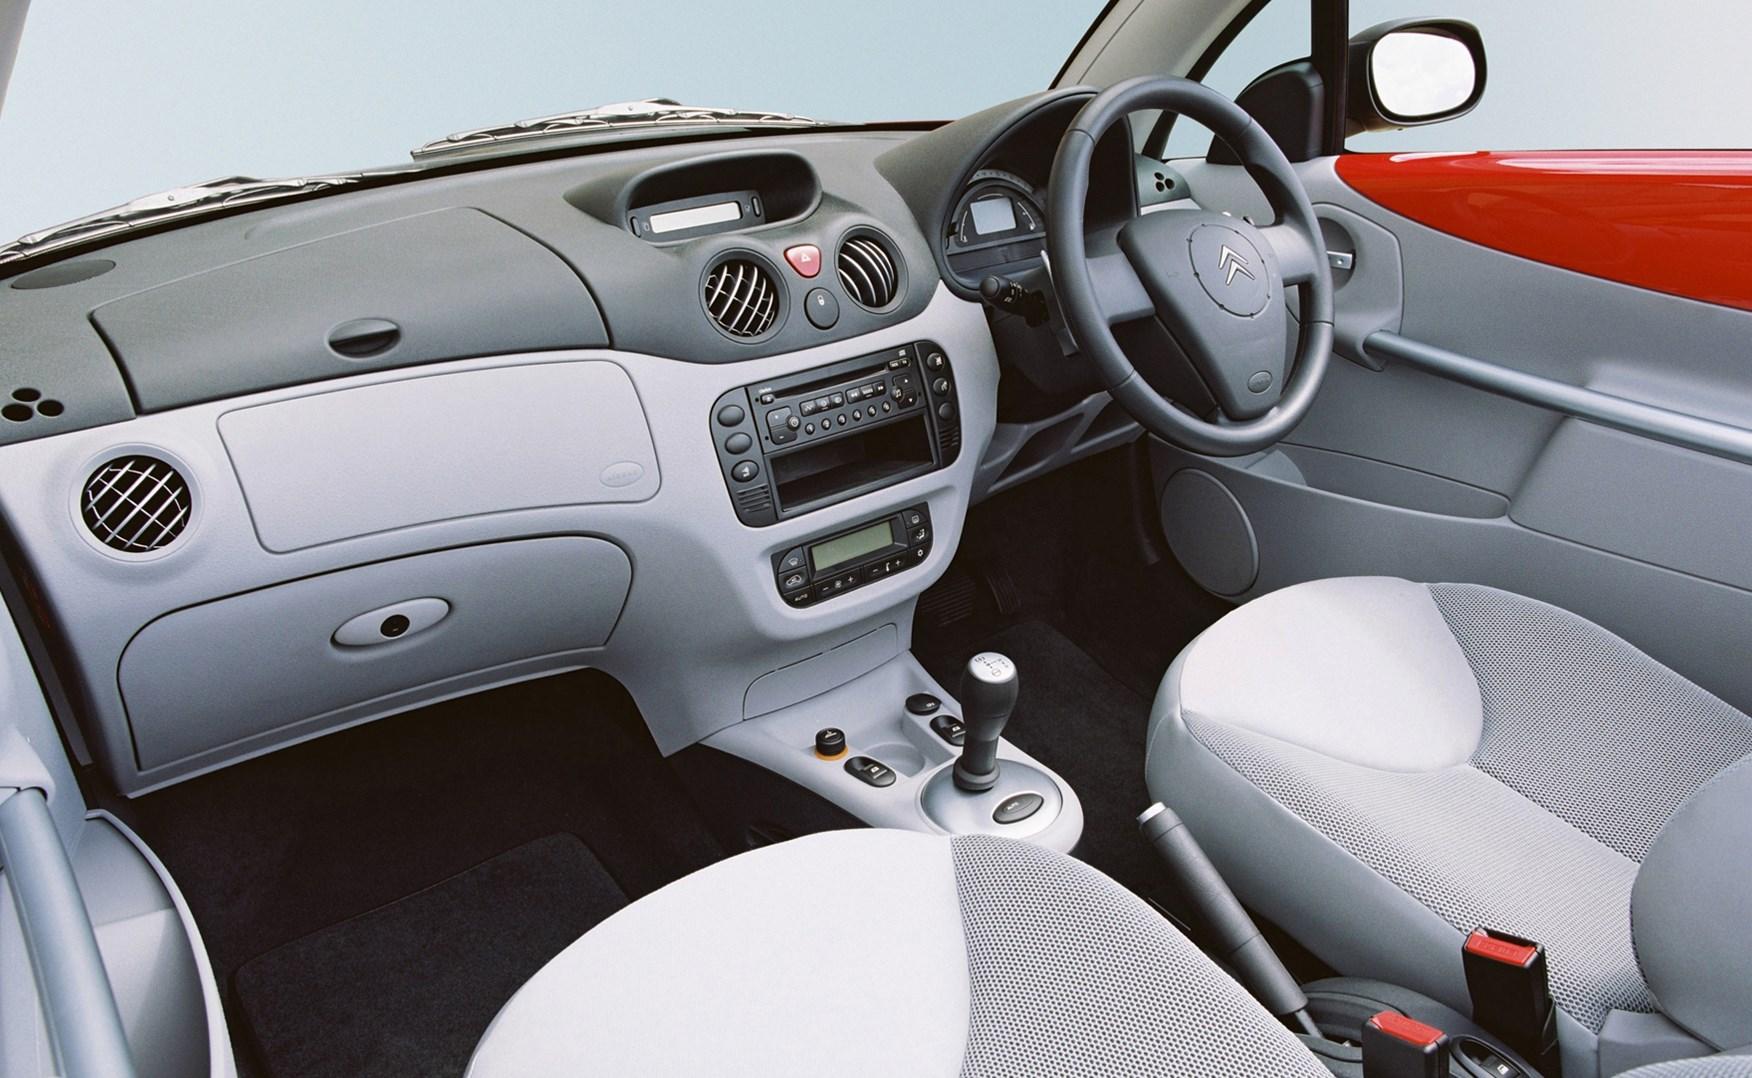 Citroen C3 I 2002 - 2006 Cabriolet #3